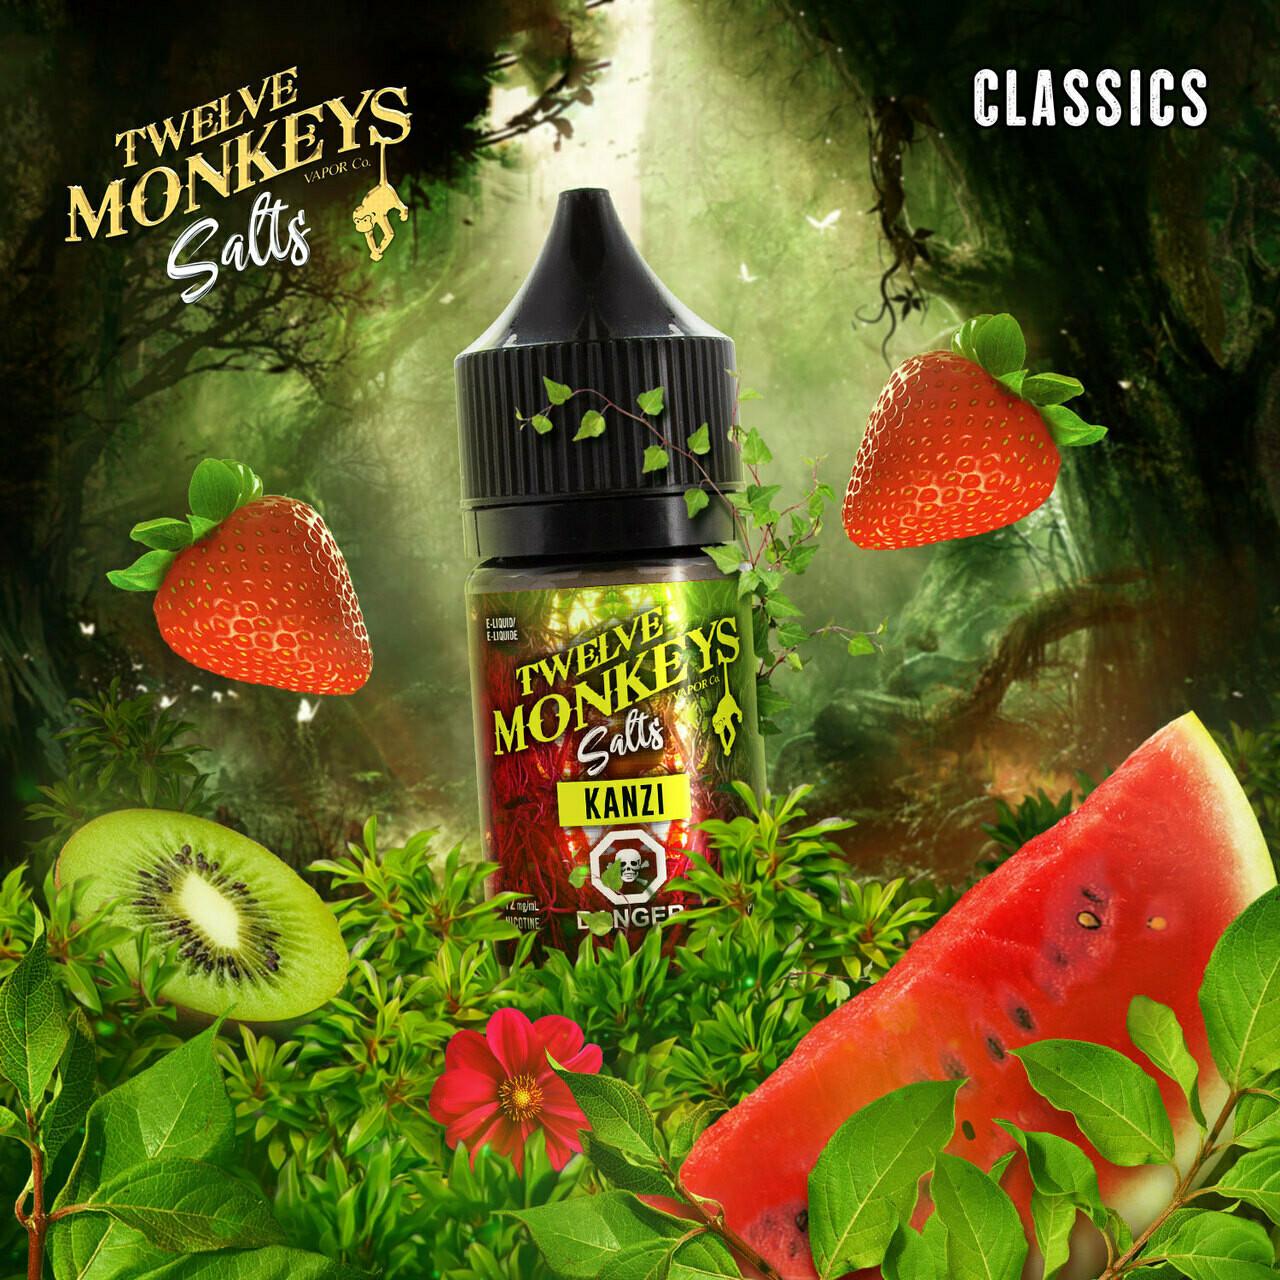 Twelve Monkeys Salt Kanzi تويلف مونكيز كانزي نيكوتين ملحي